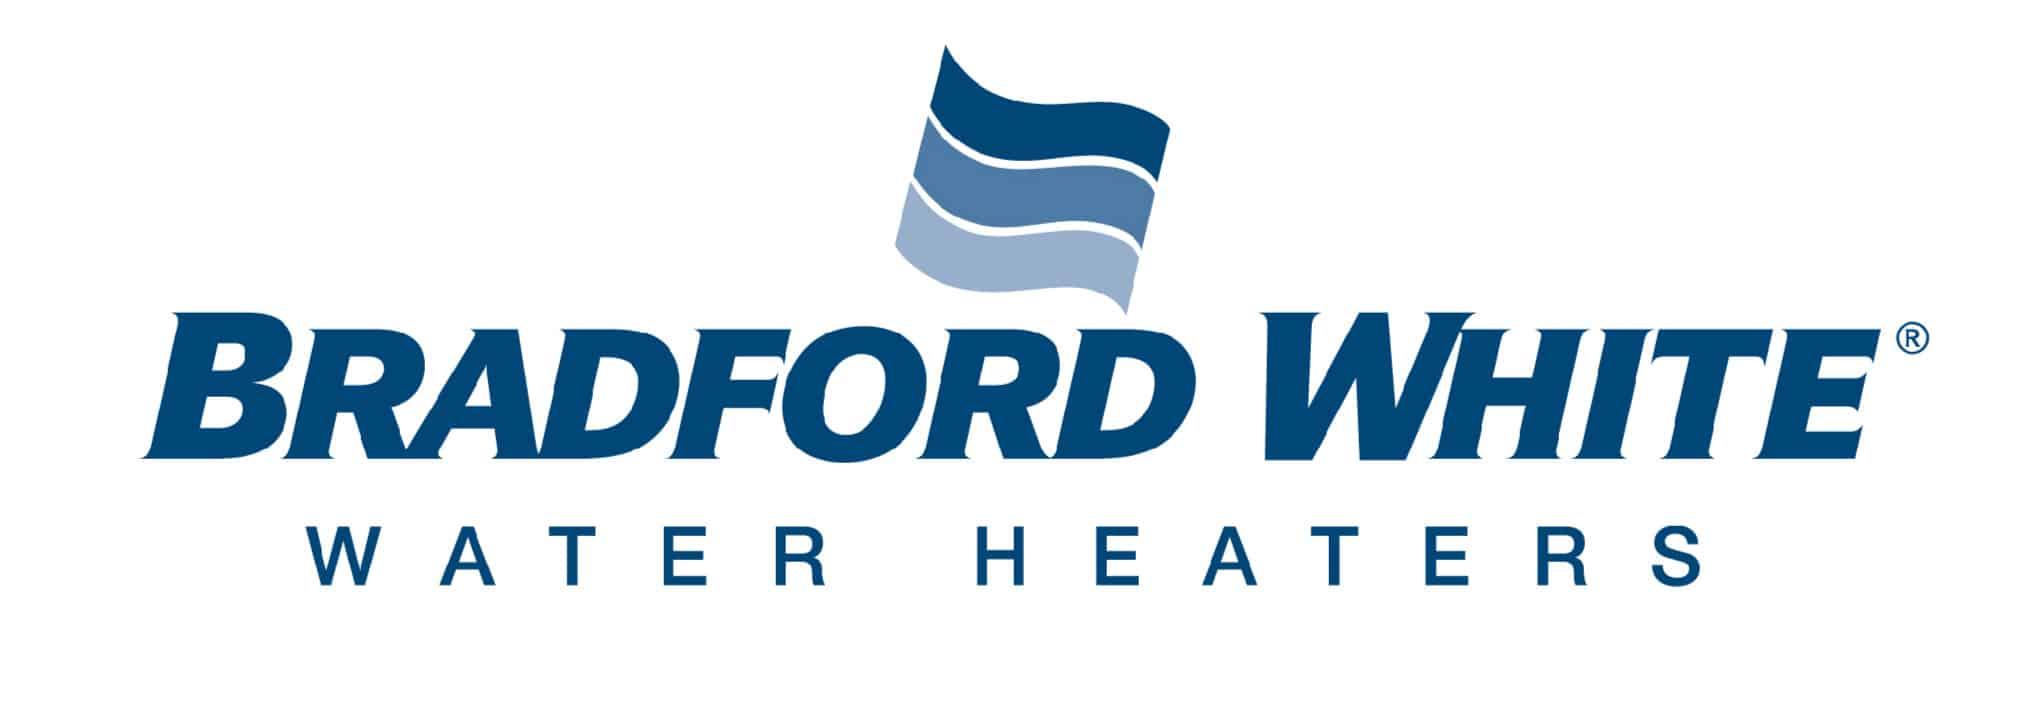 bradford-white-water-heaters-logo